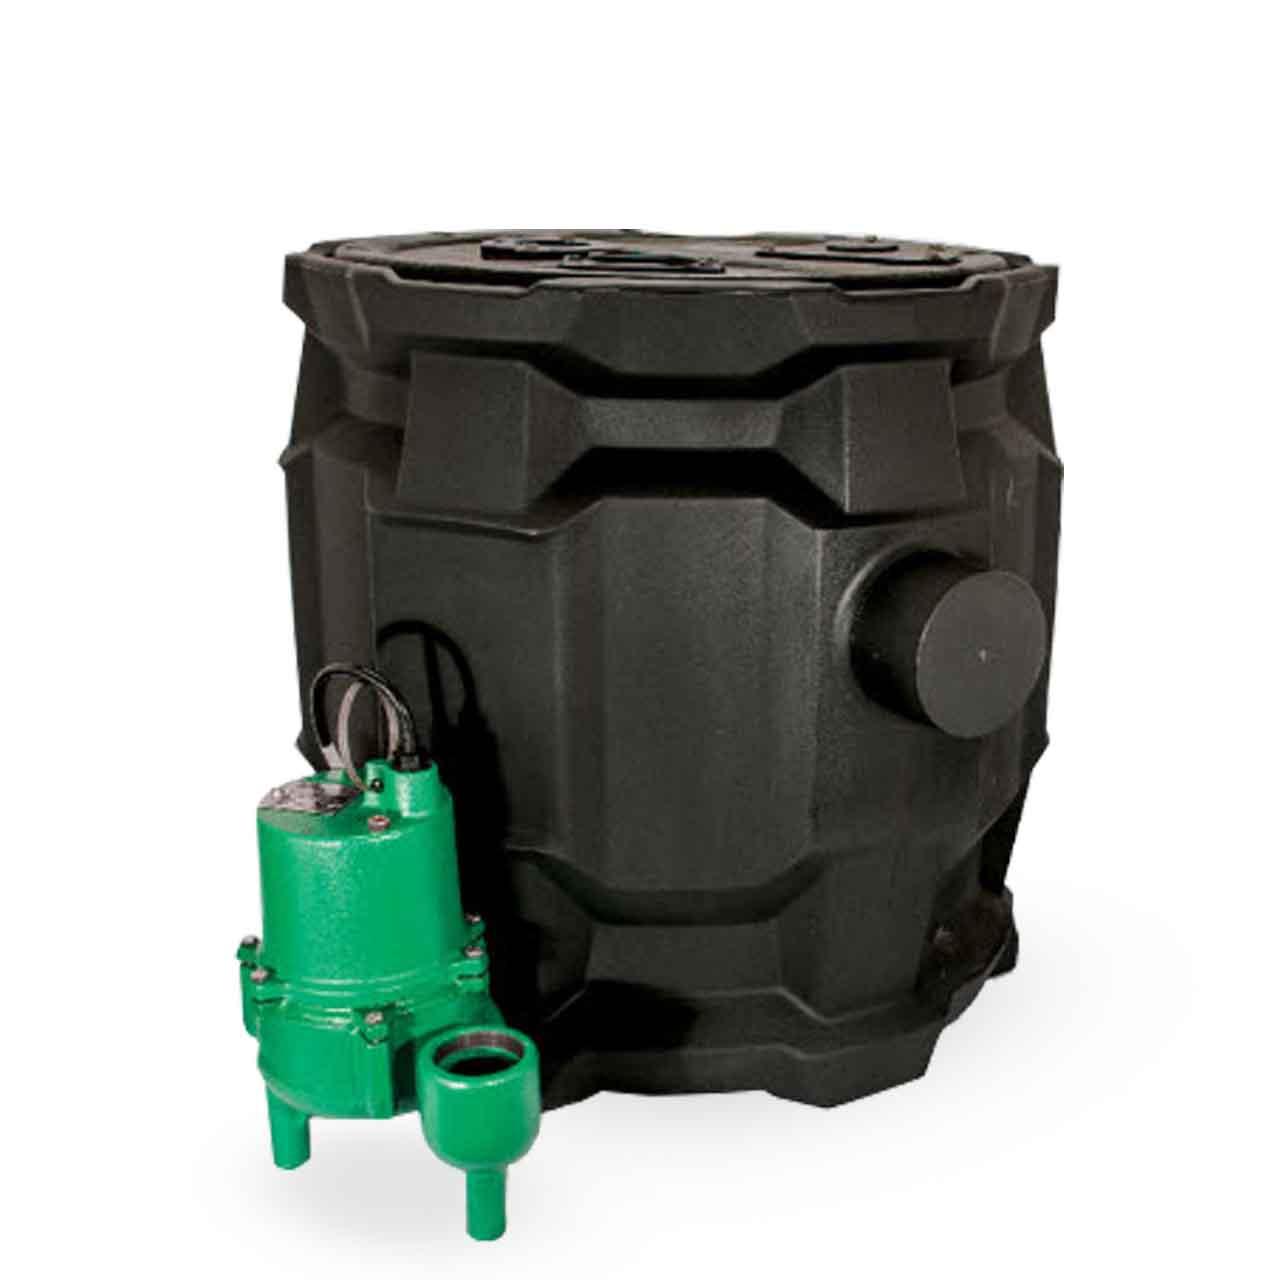 Myers Sb24srm Sewage Basin System 0 4 Hp R C Worst Amp Co